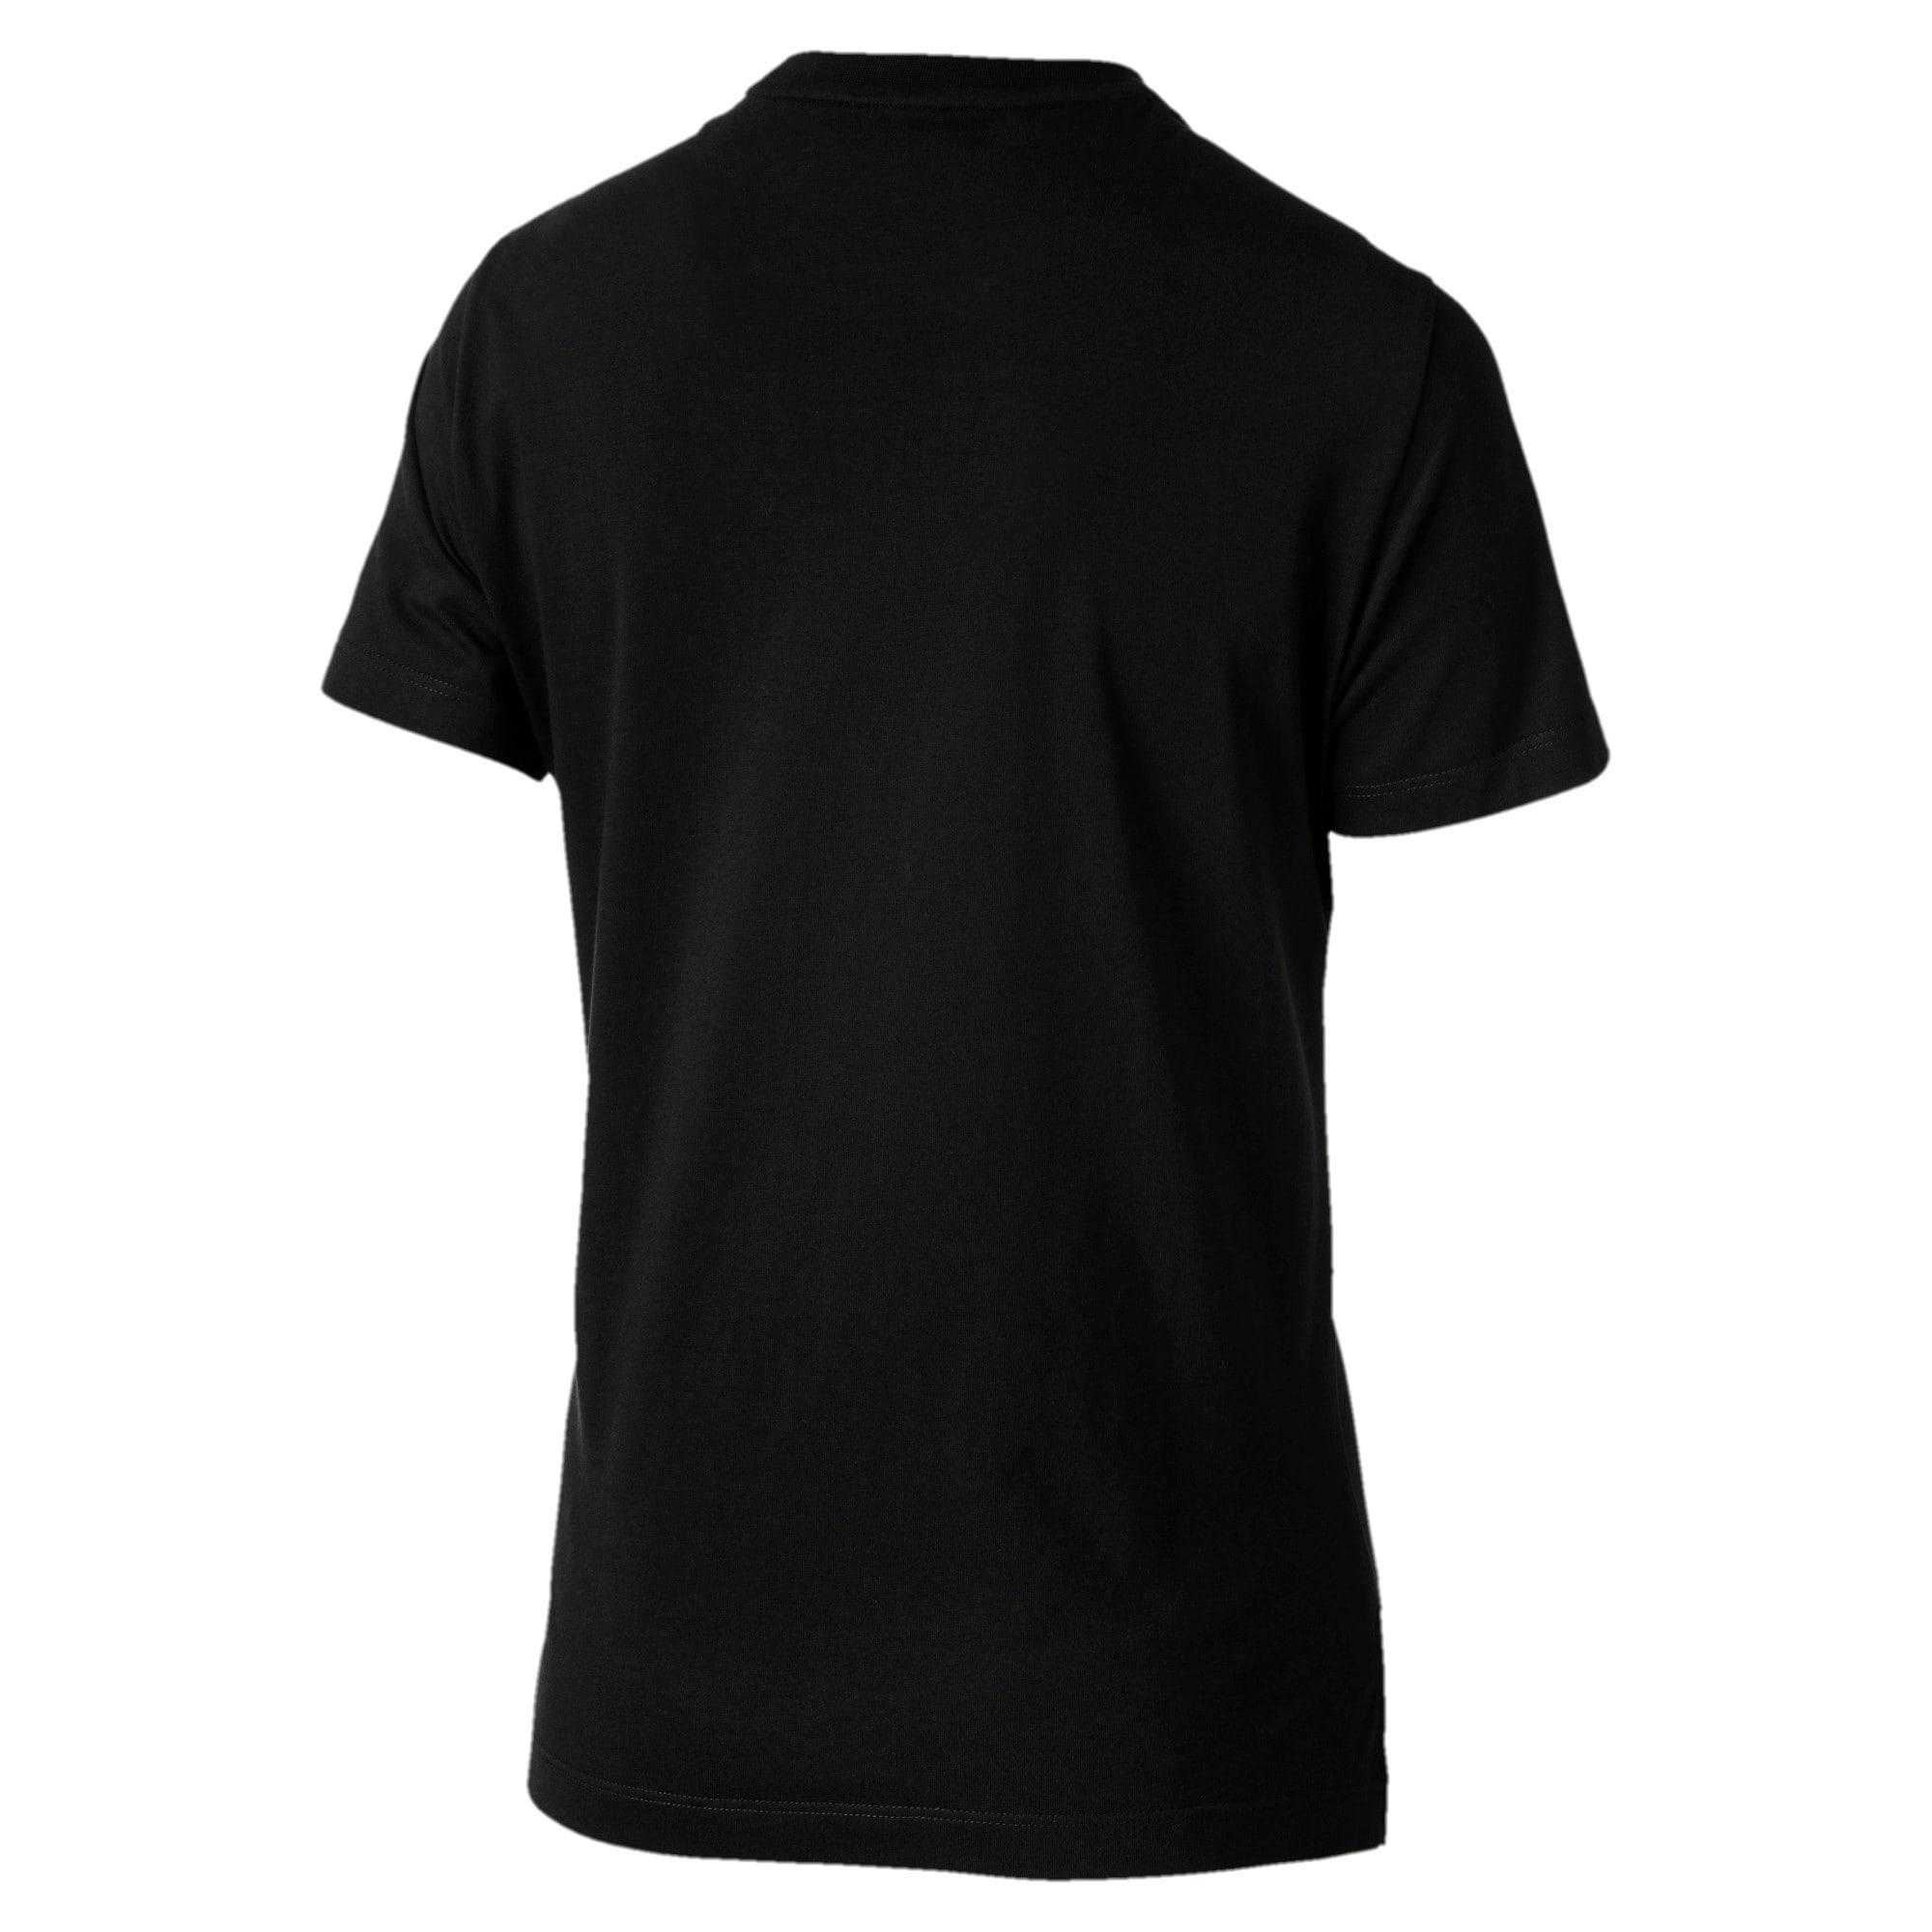 Thumbnail 4 of Classics Logo Women's T-Shirt, Cotton Black, medium